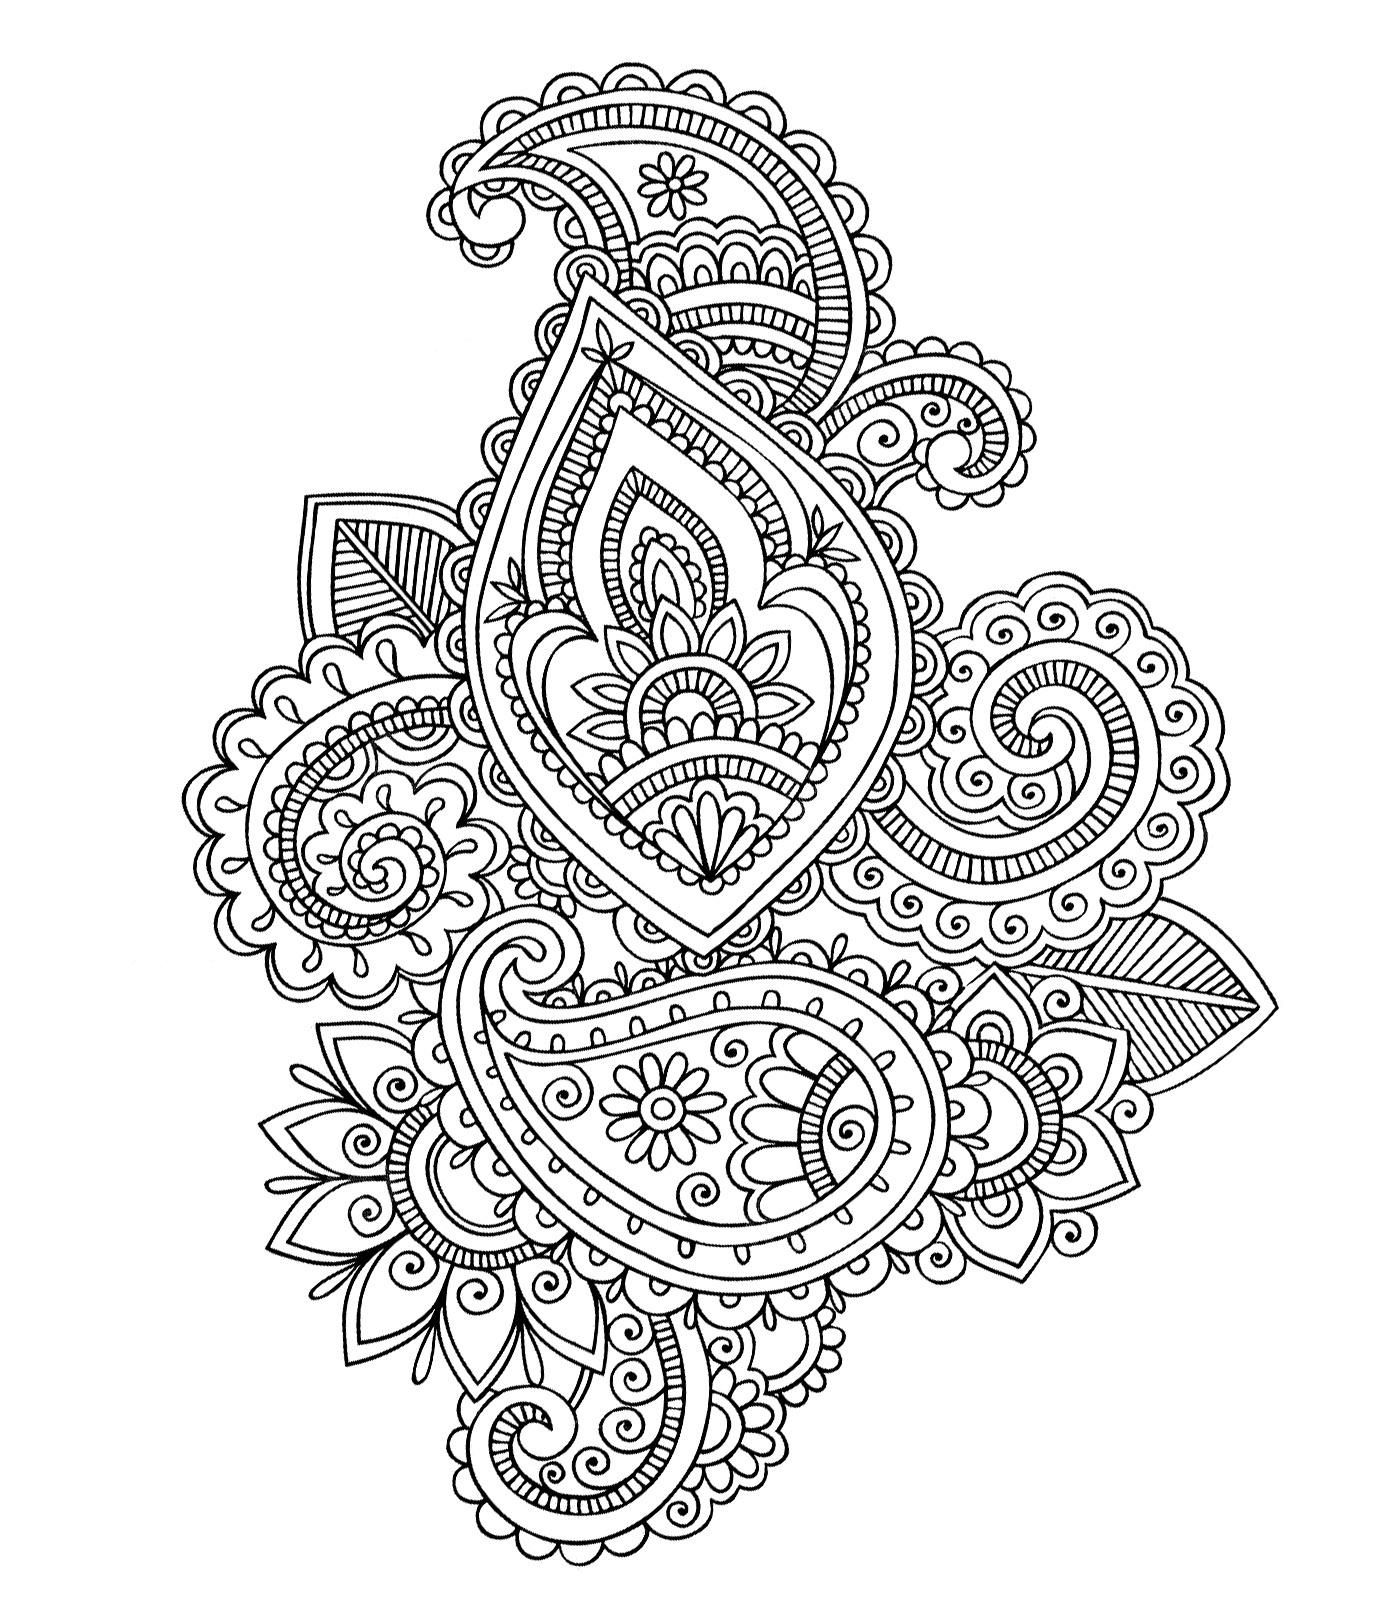 M ndalas para colorear dibujos mandalas para imprimir for Cool animal coloring pages for adults